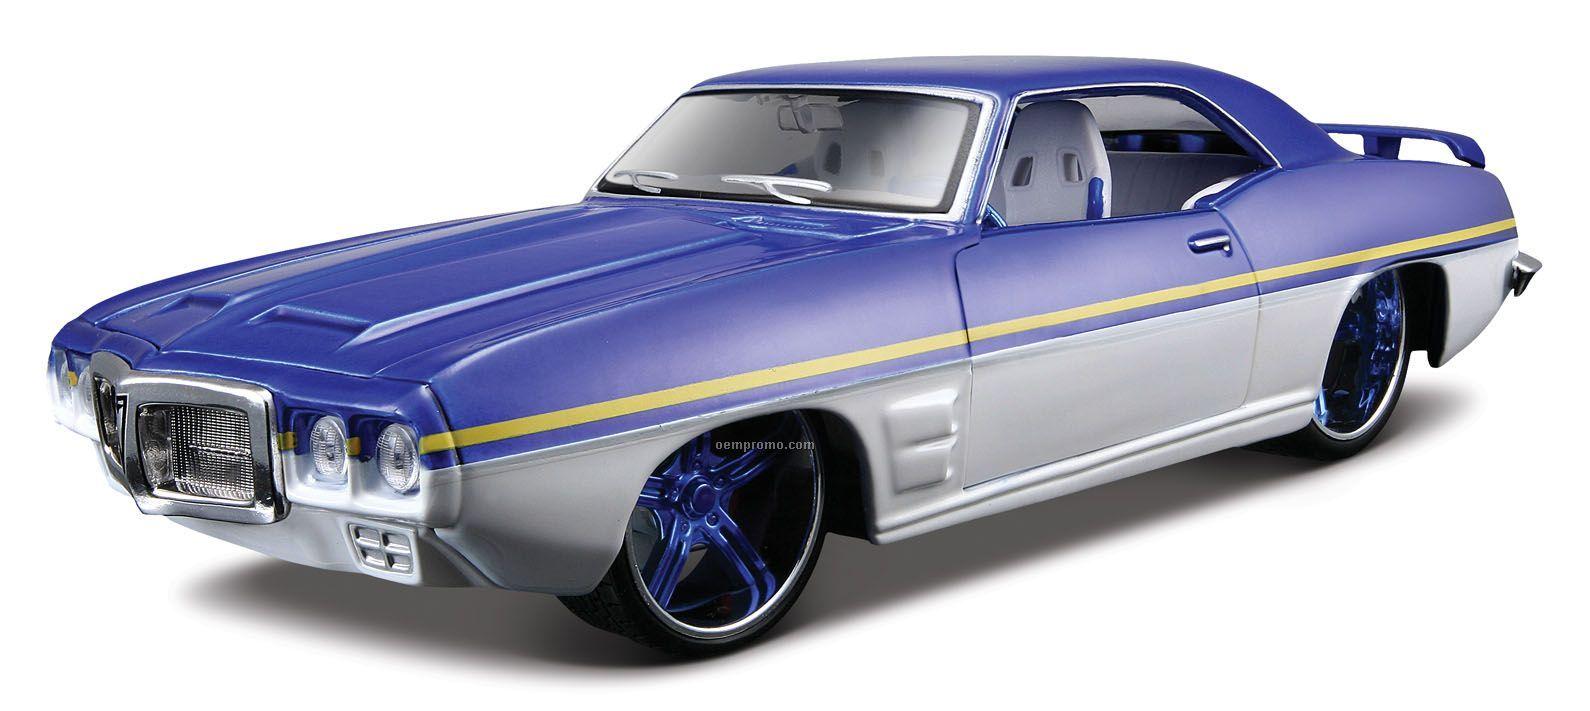 "7""X2-1/2""X3"" 1969 Pontiac Firebird All Star Series Die Cast Replica"